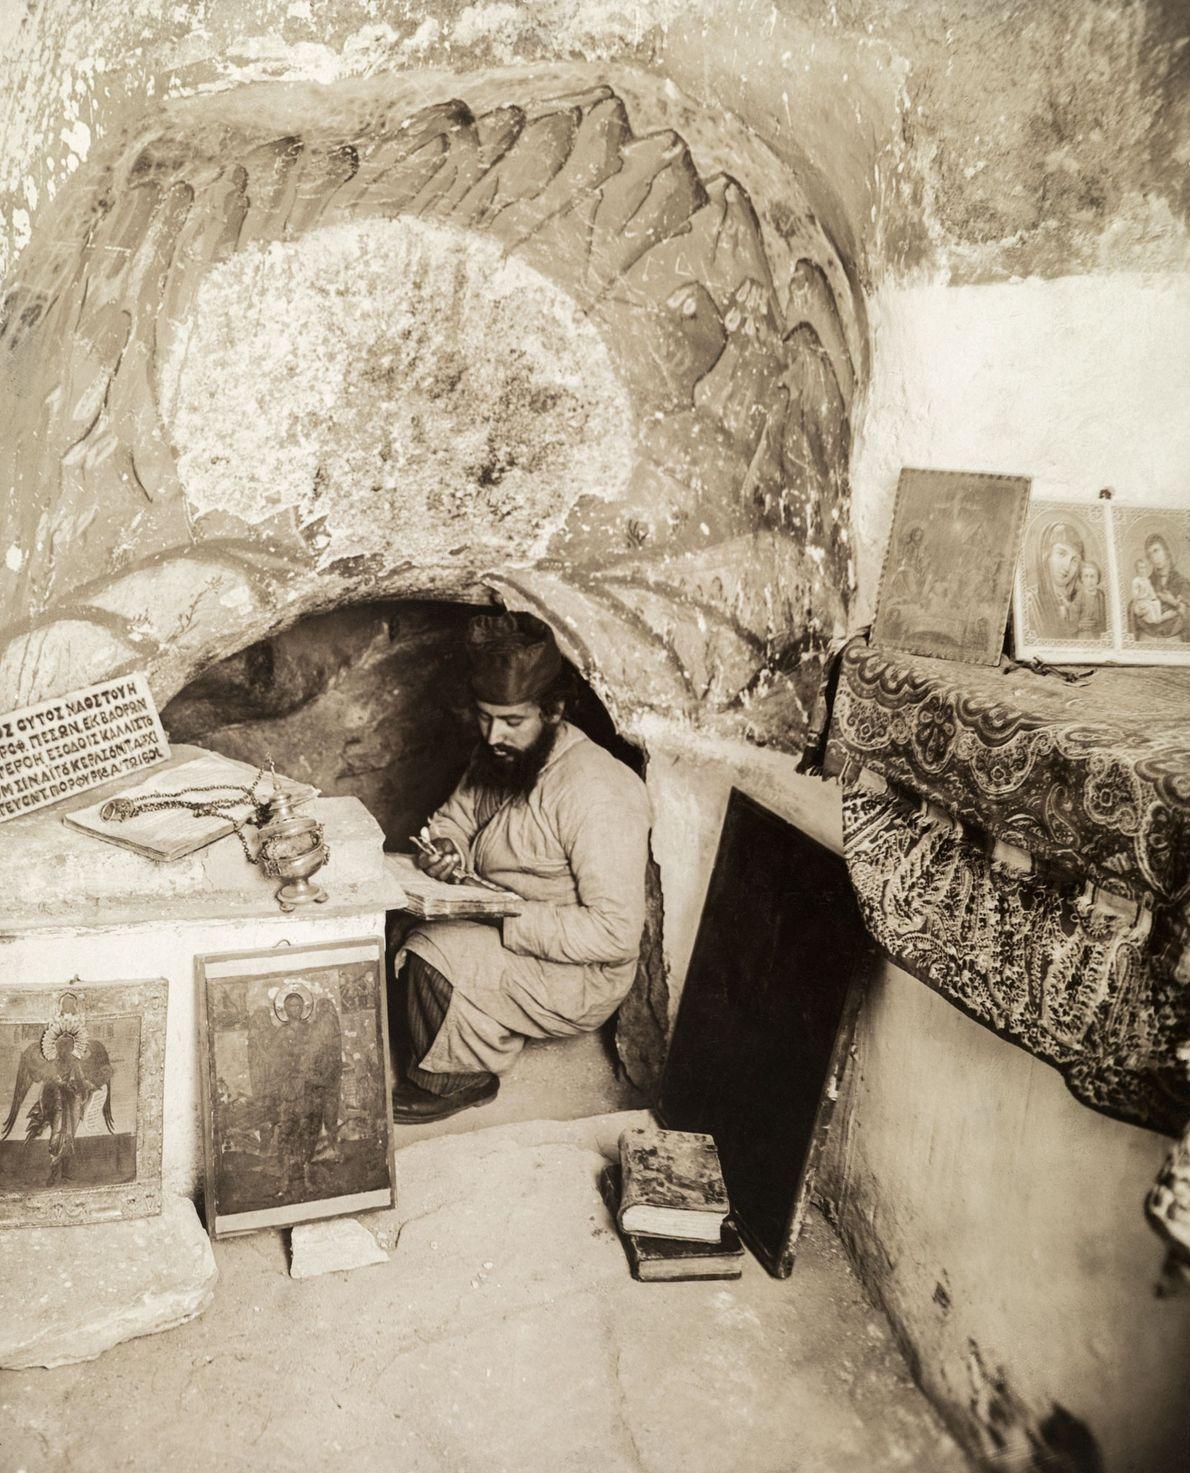 Mönch in Höhle, Israel